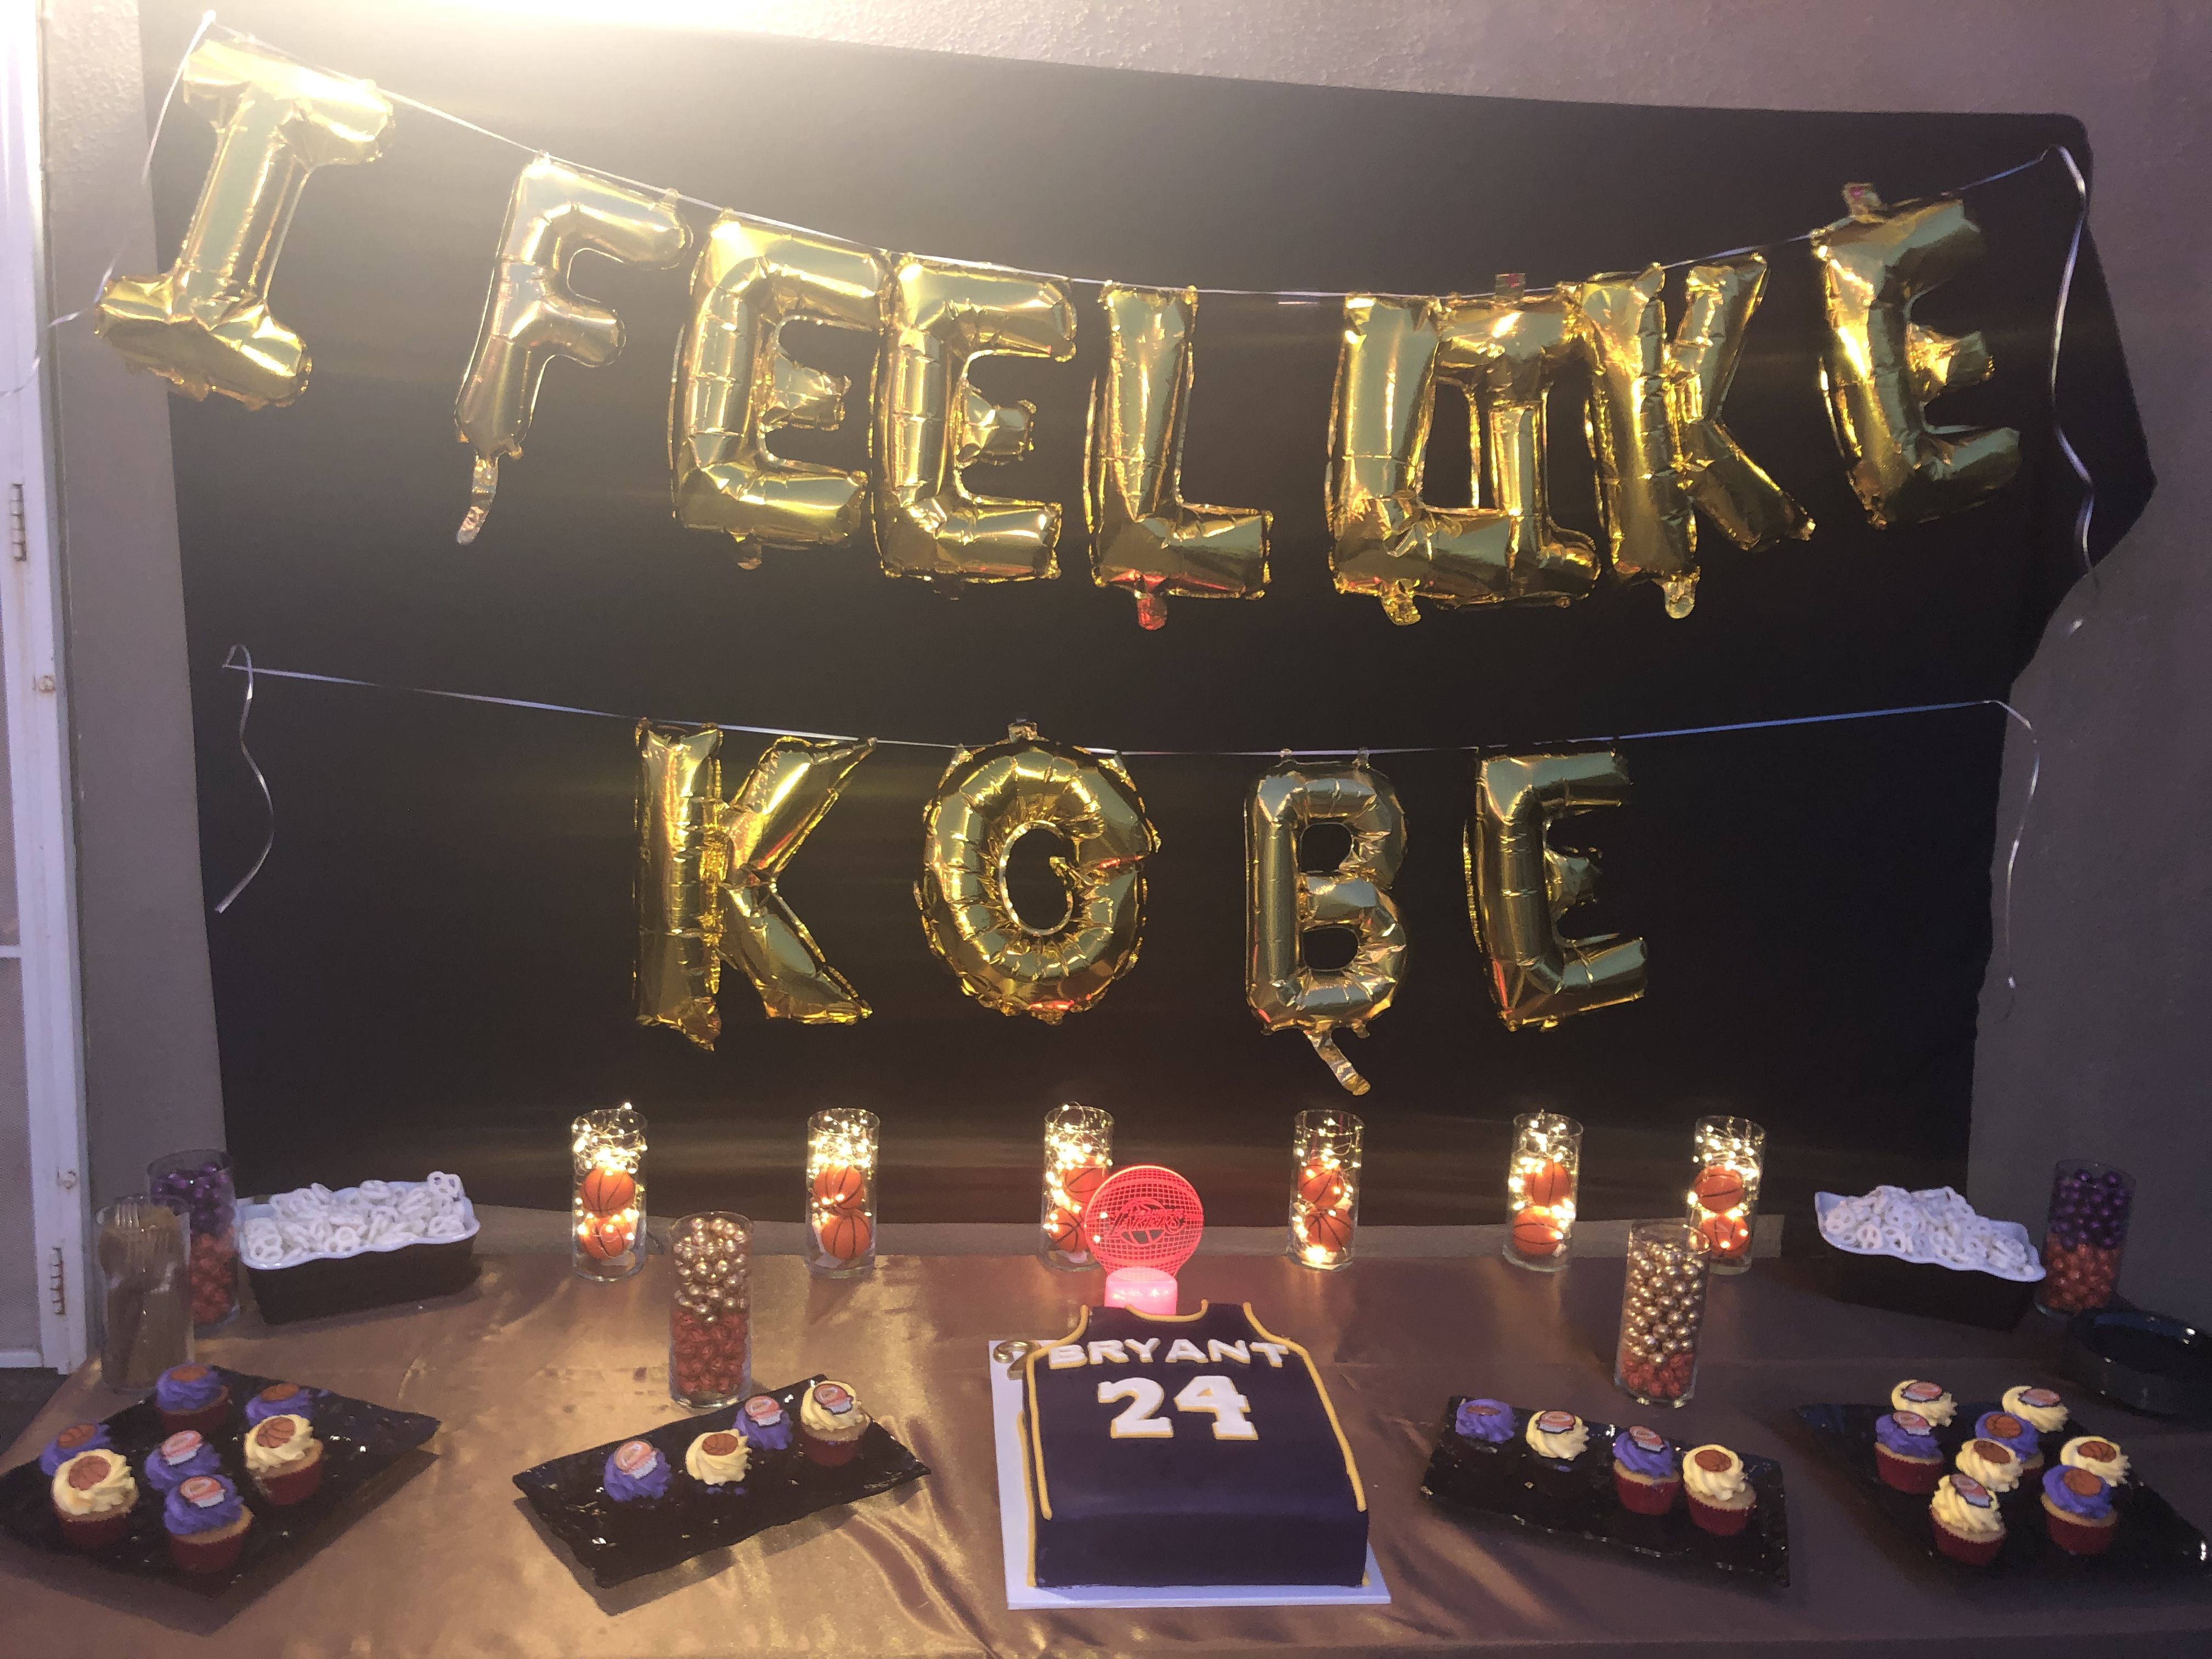 Lakers & KOBE themed dessert table 24th birthday, Themed